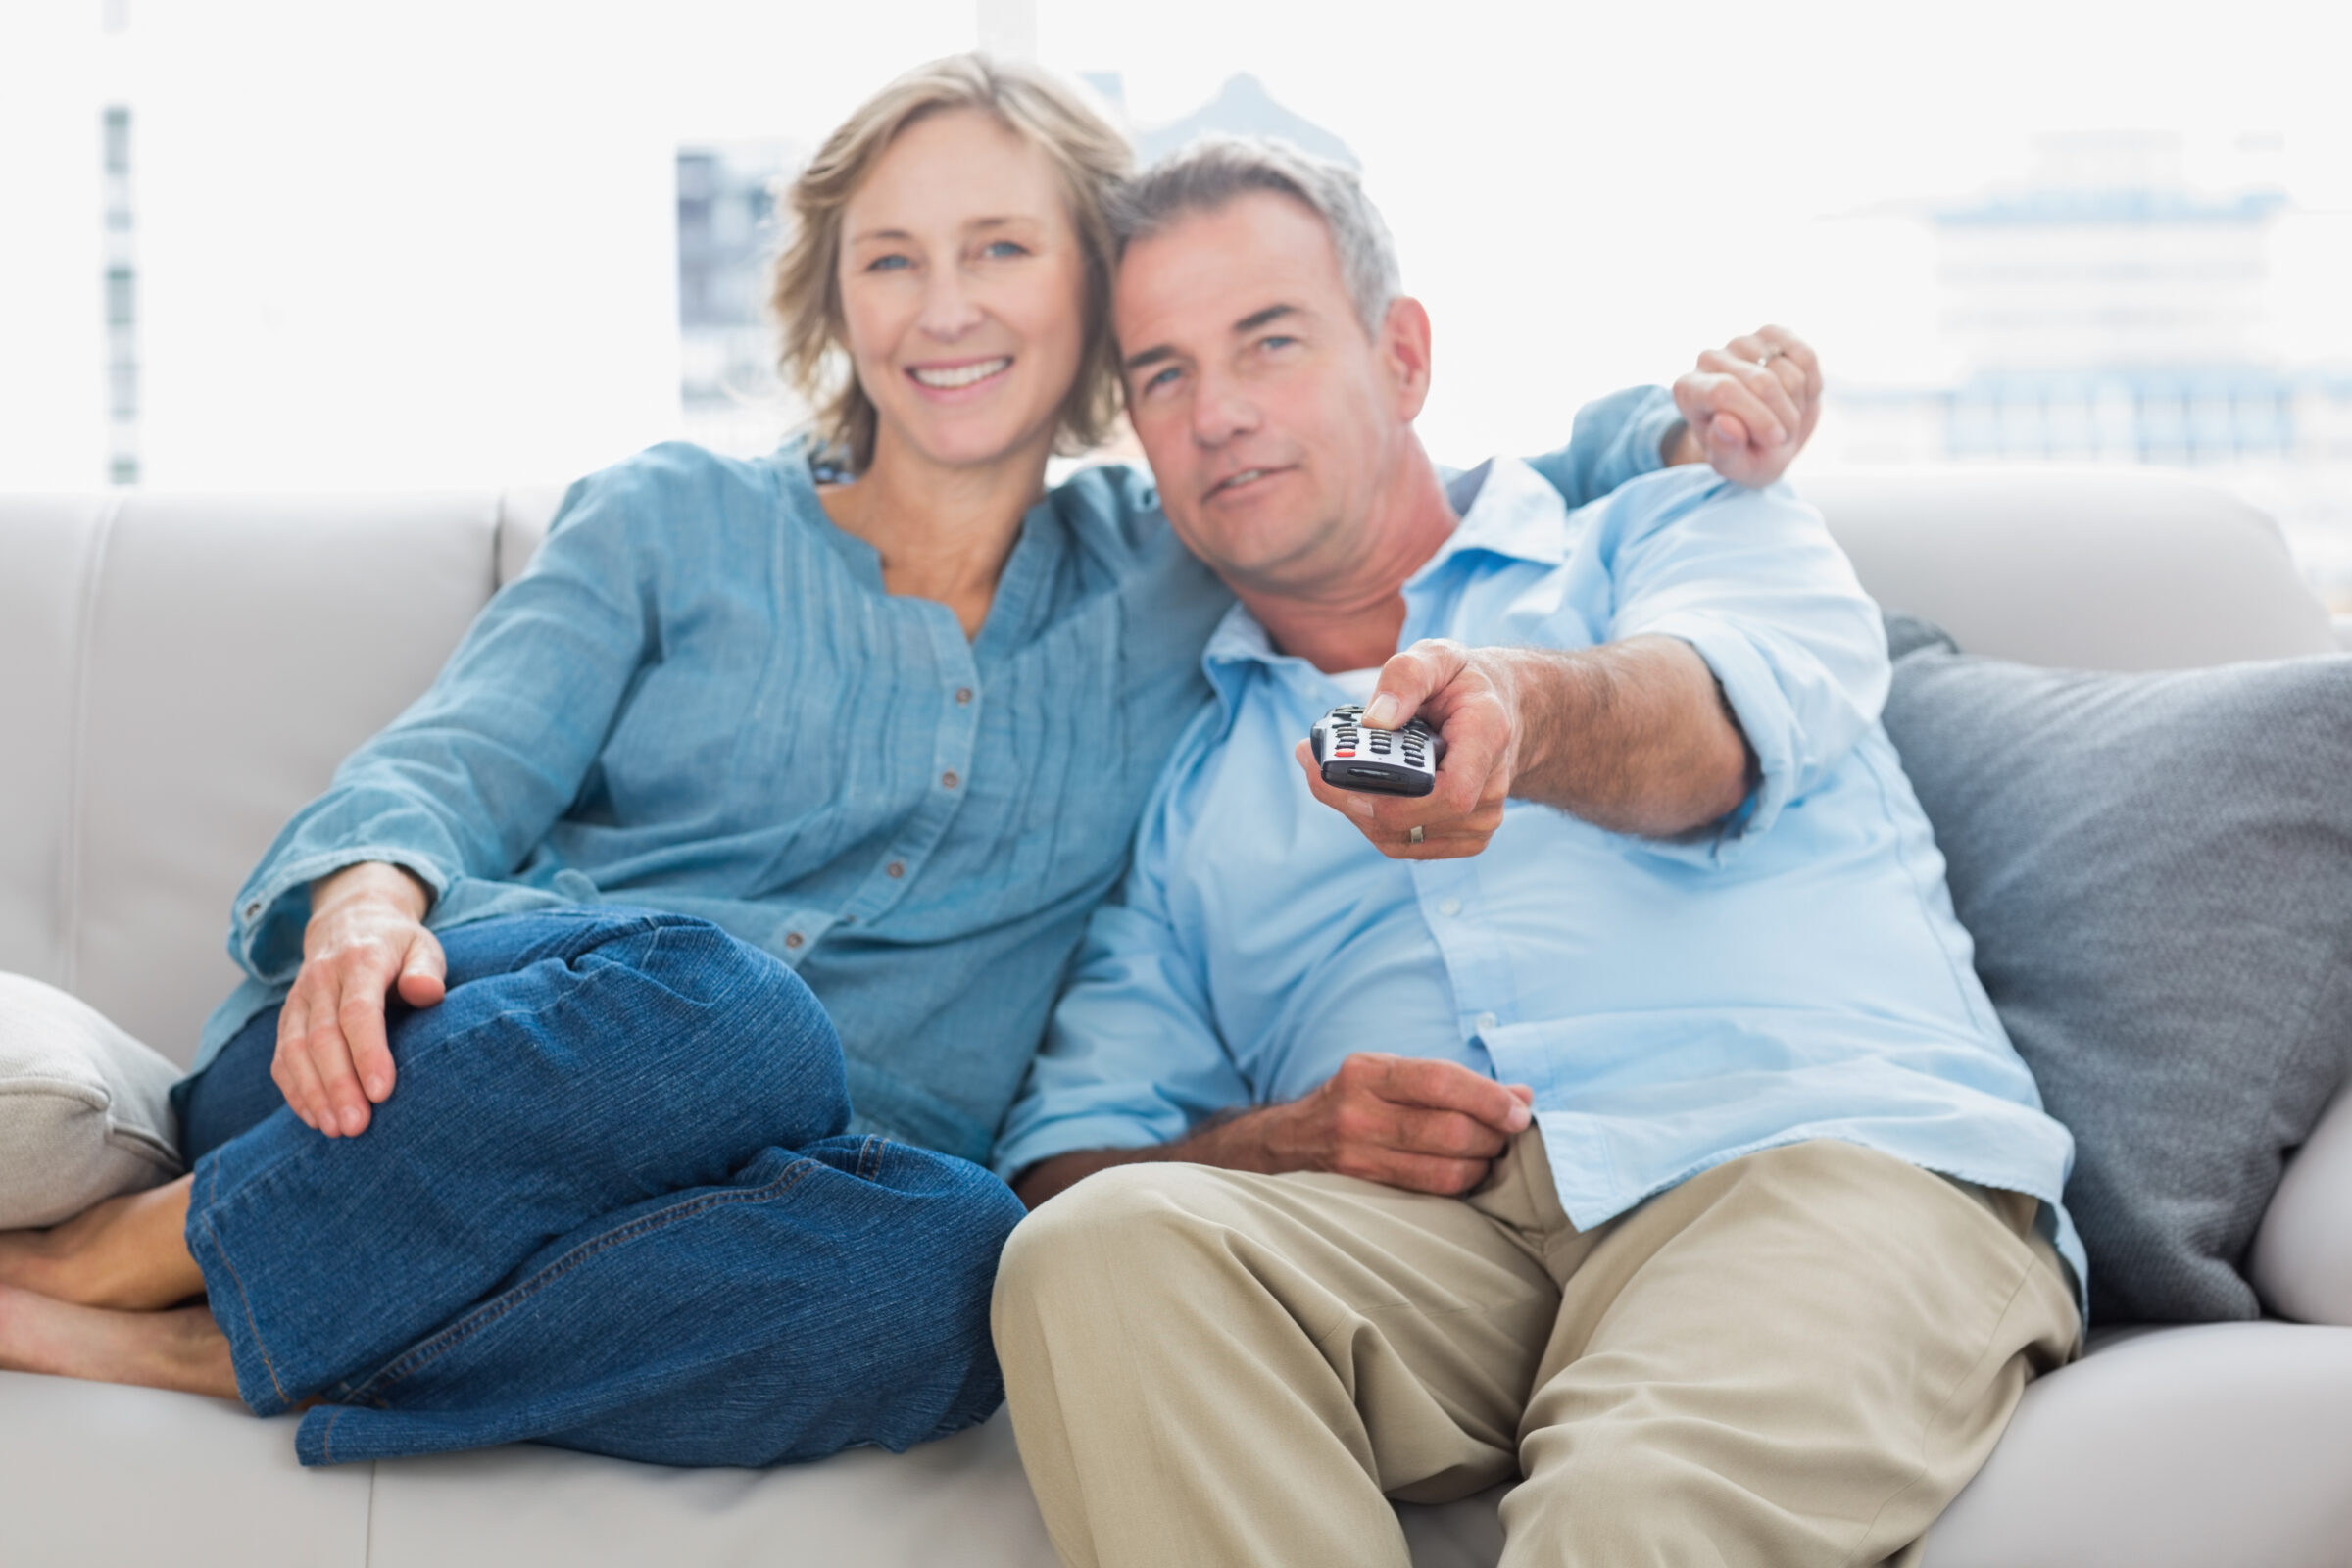 Casal feliz assistindo a Tv juntos no sofá, Desperta Débora